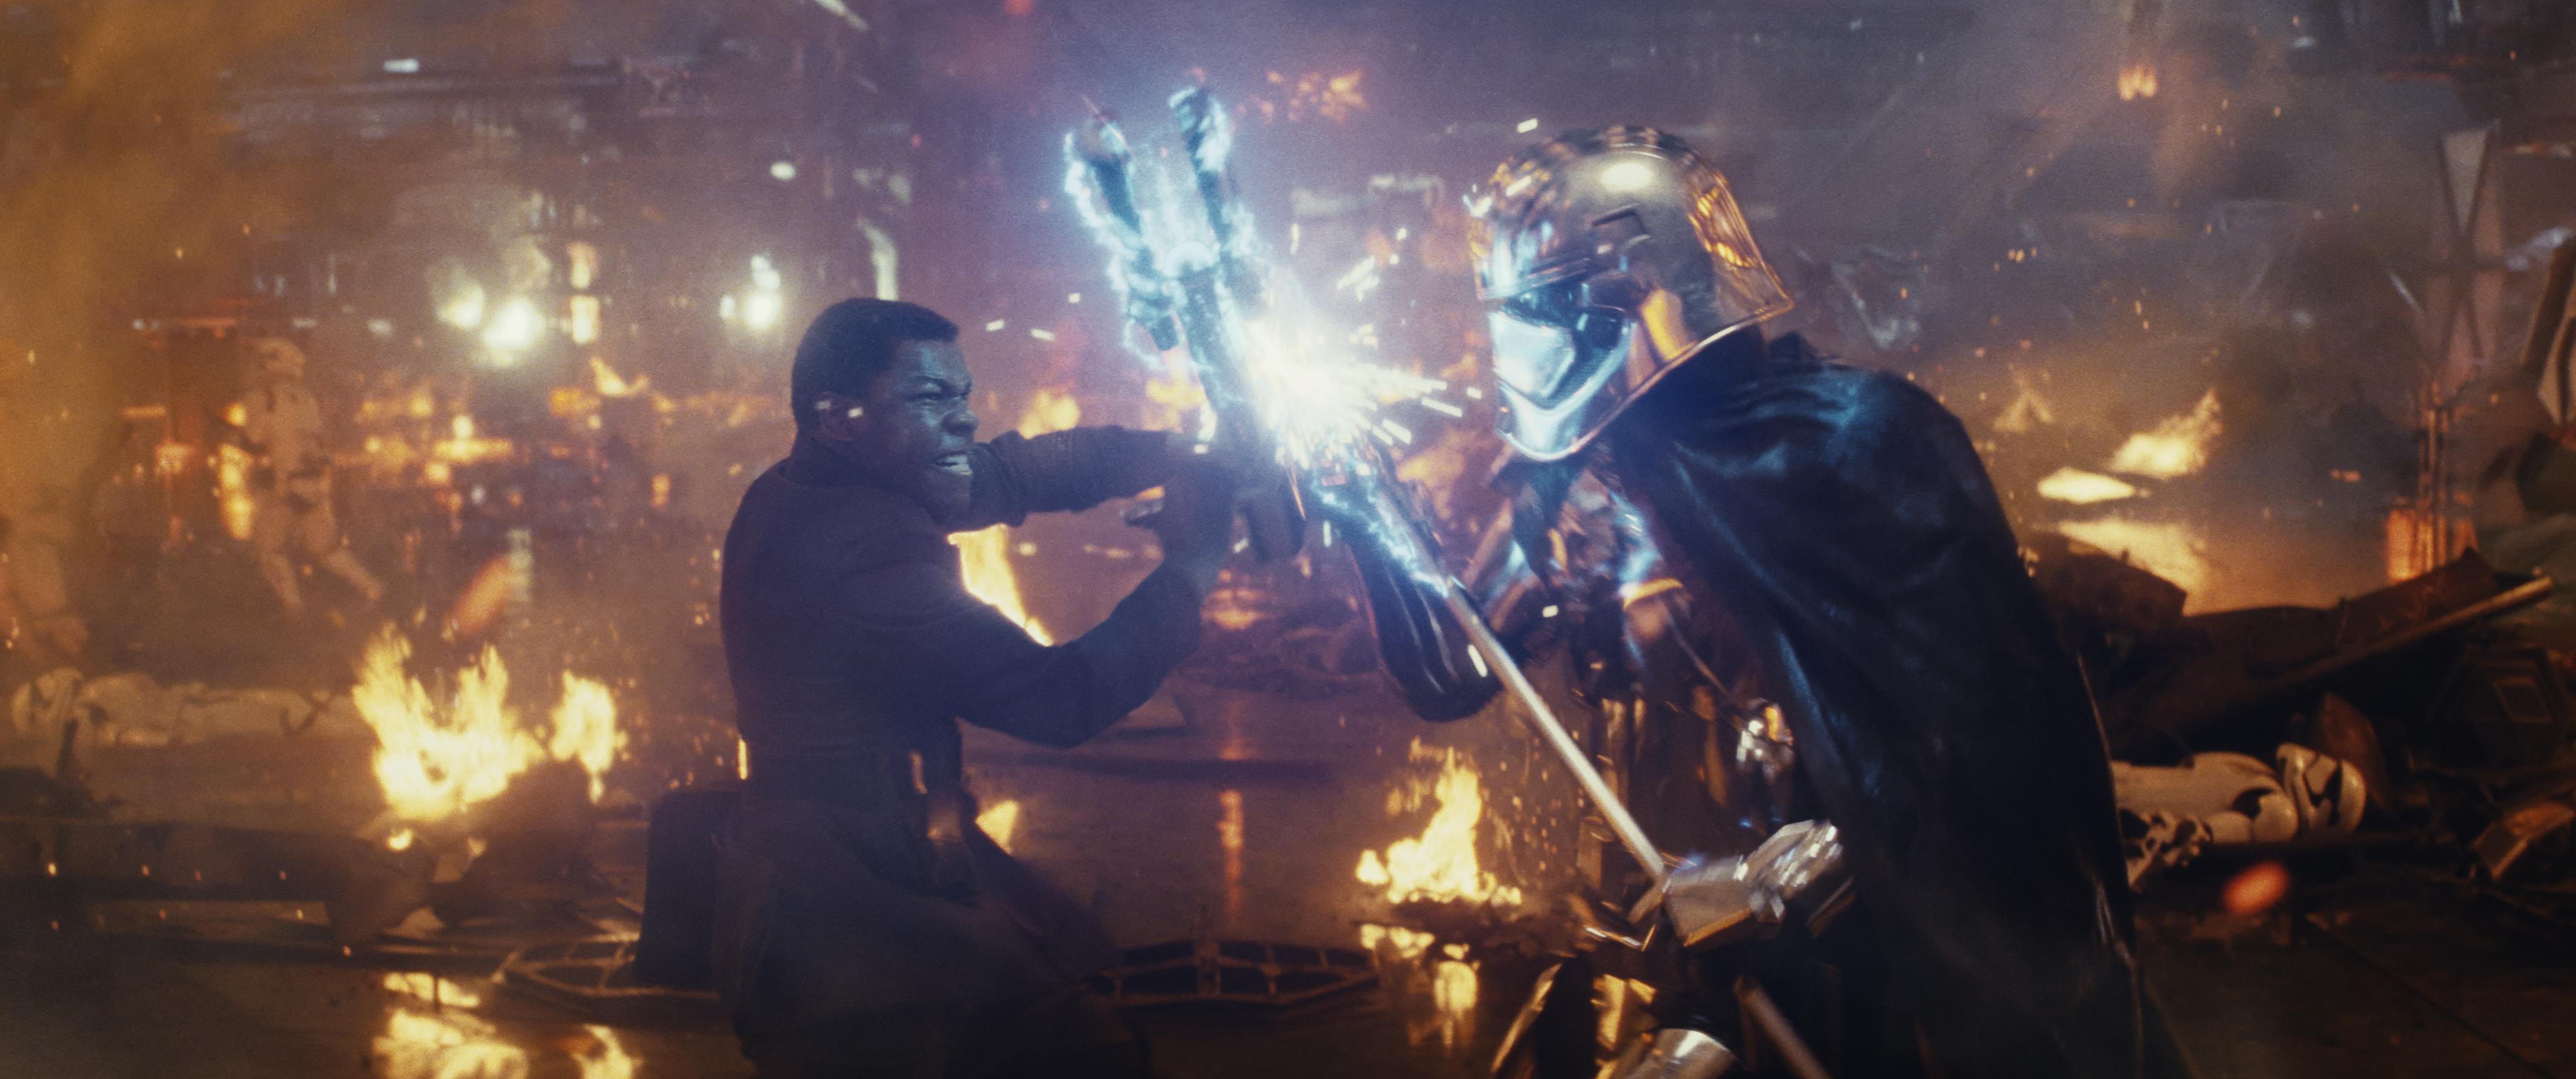 Star-Wars-The-Last-Jedi-Finn-vs-Captain-Phasma